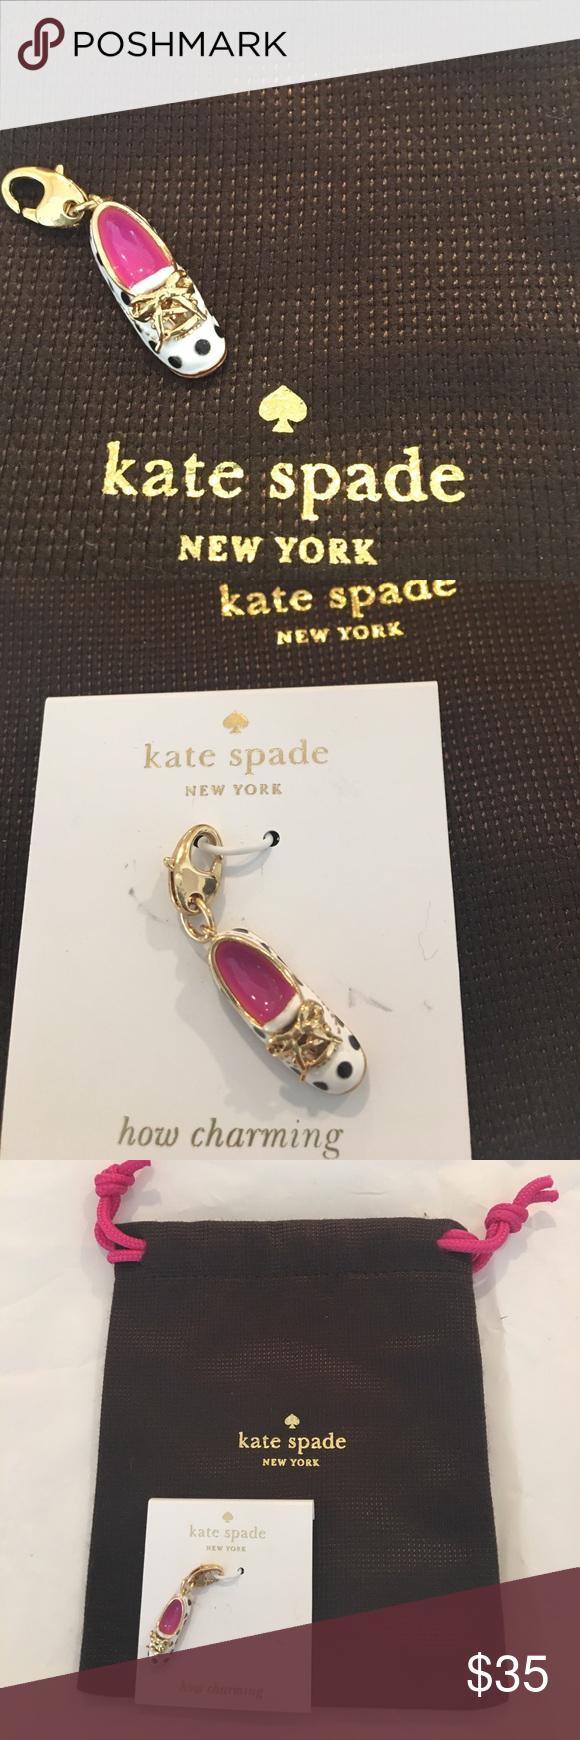 NWT Kate Spade Polka Dot Sneaker Shoe Charm NWT Kate Spade Polka Dot Sneaker Shoe Charm kate spade Jewelry